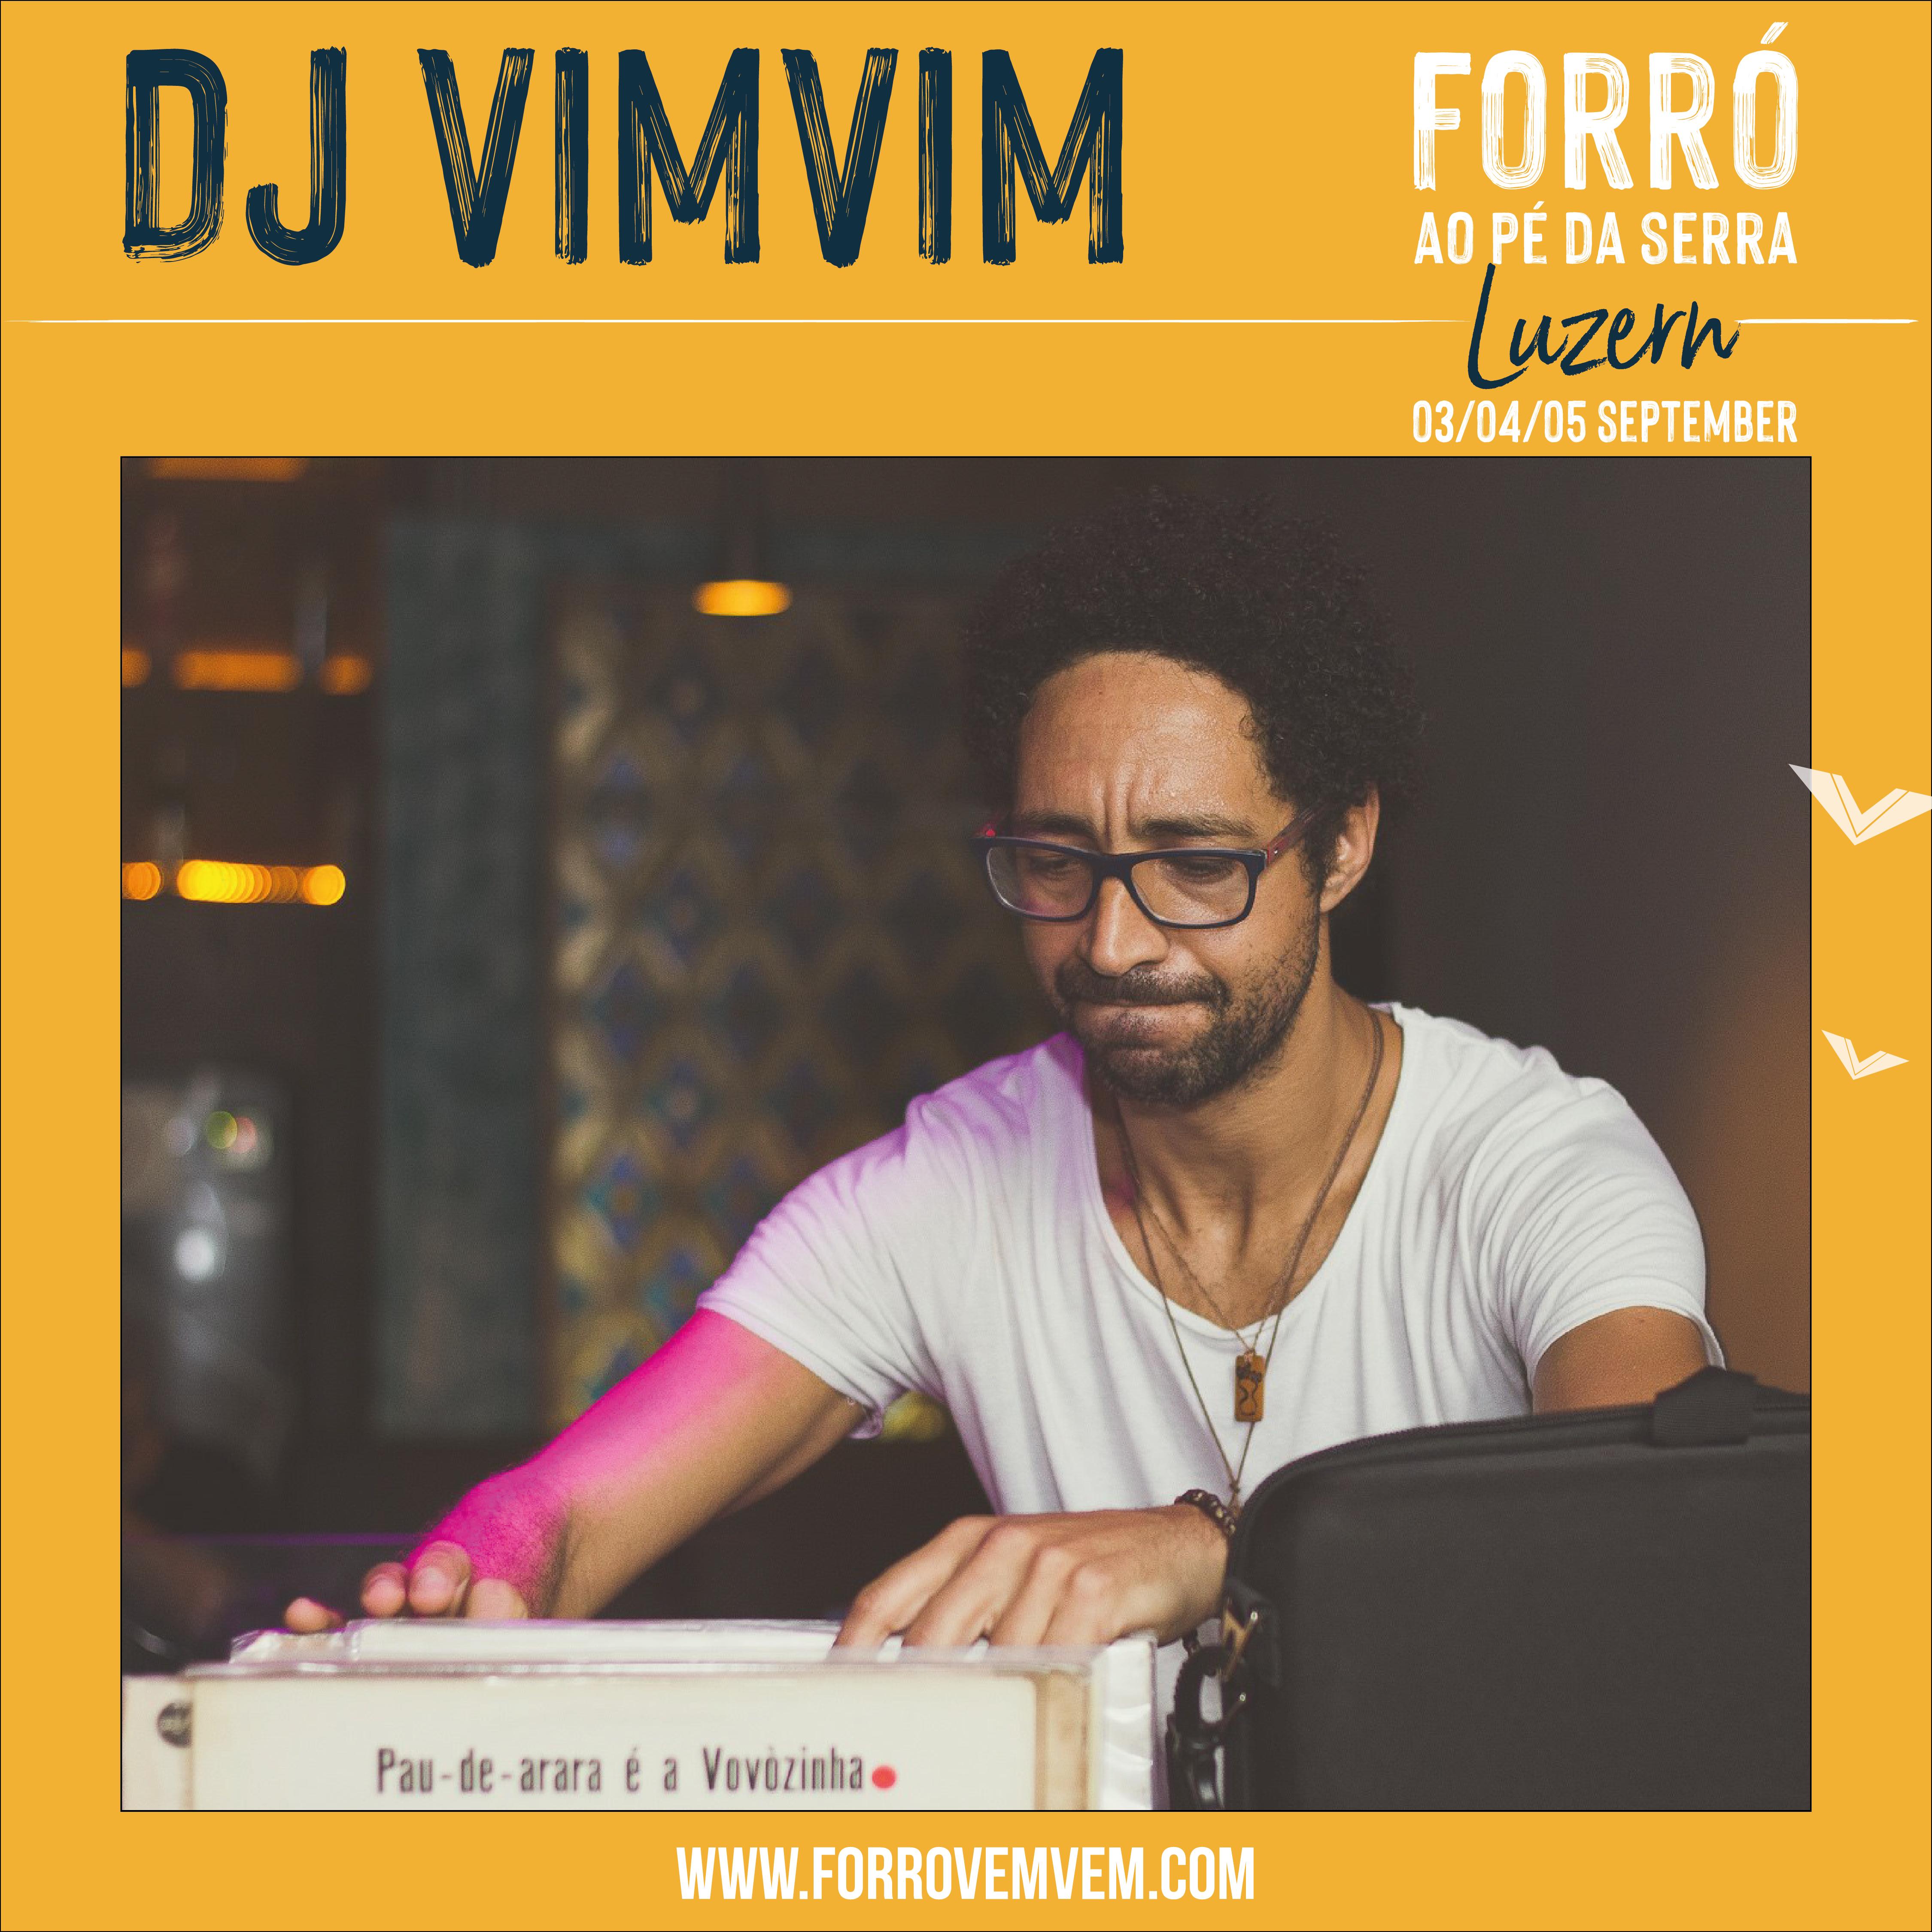 DJ VIM VIM